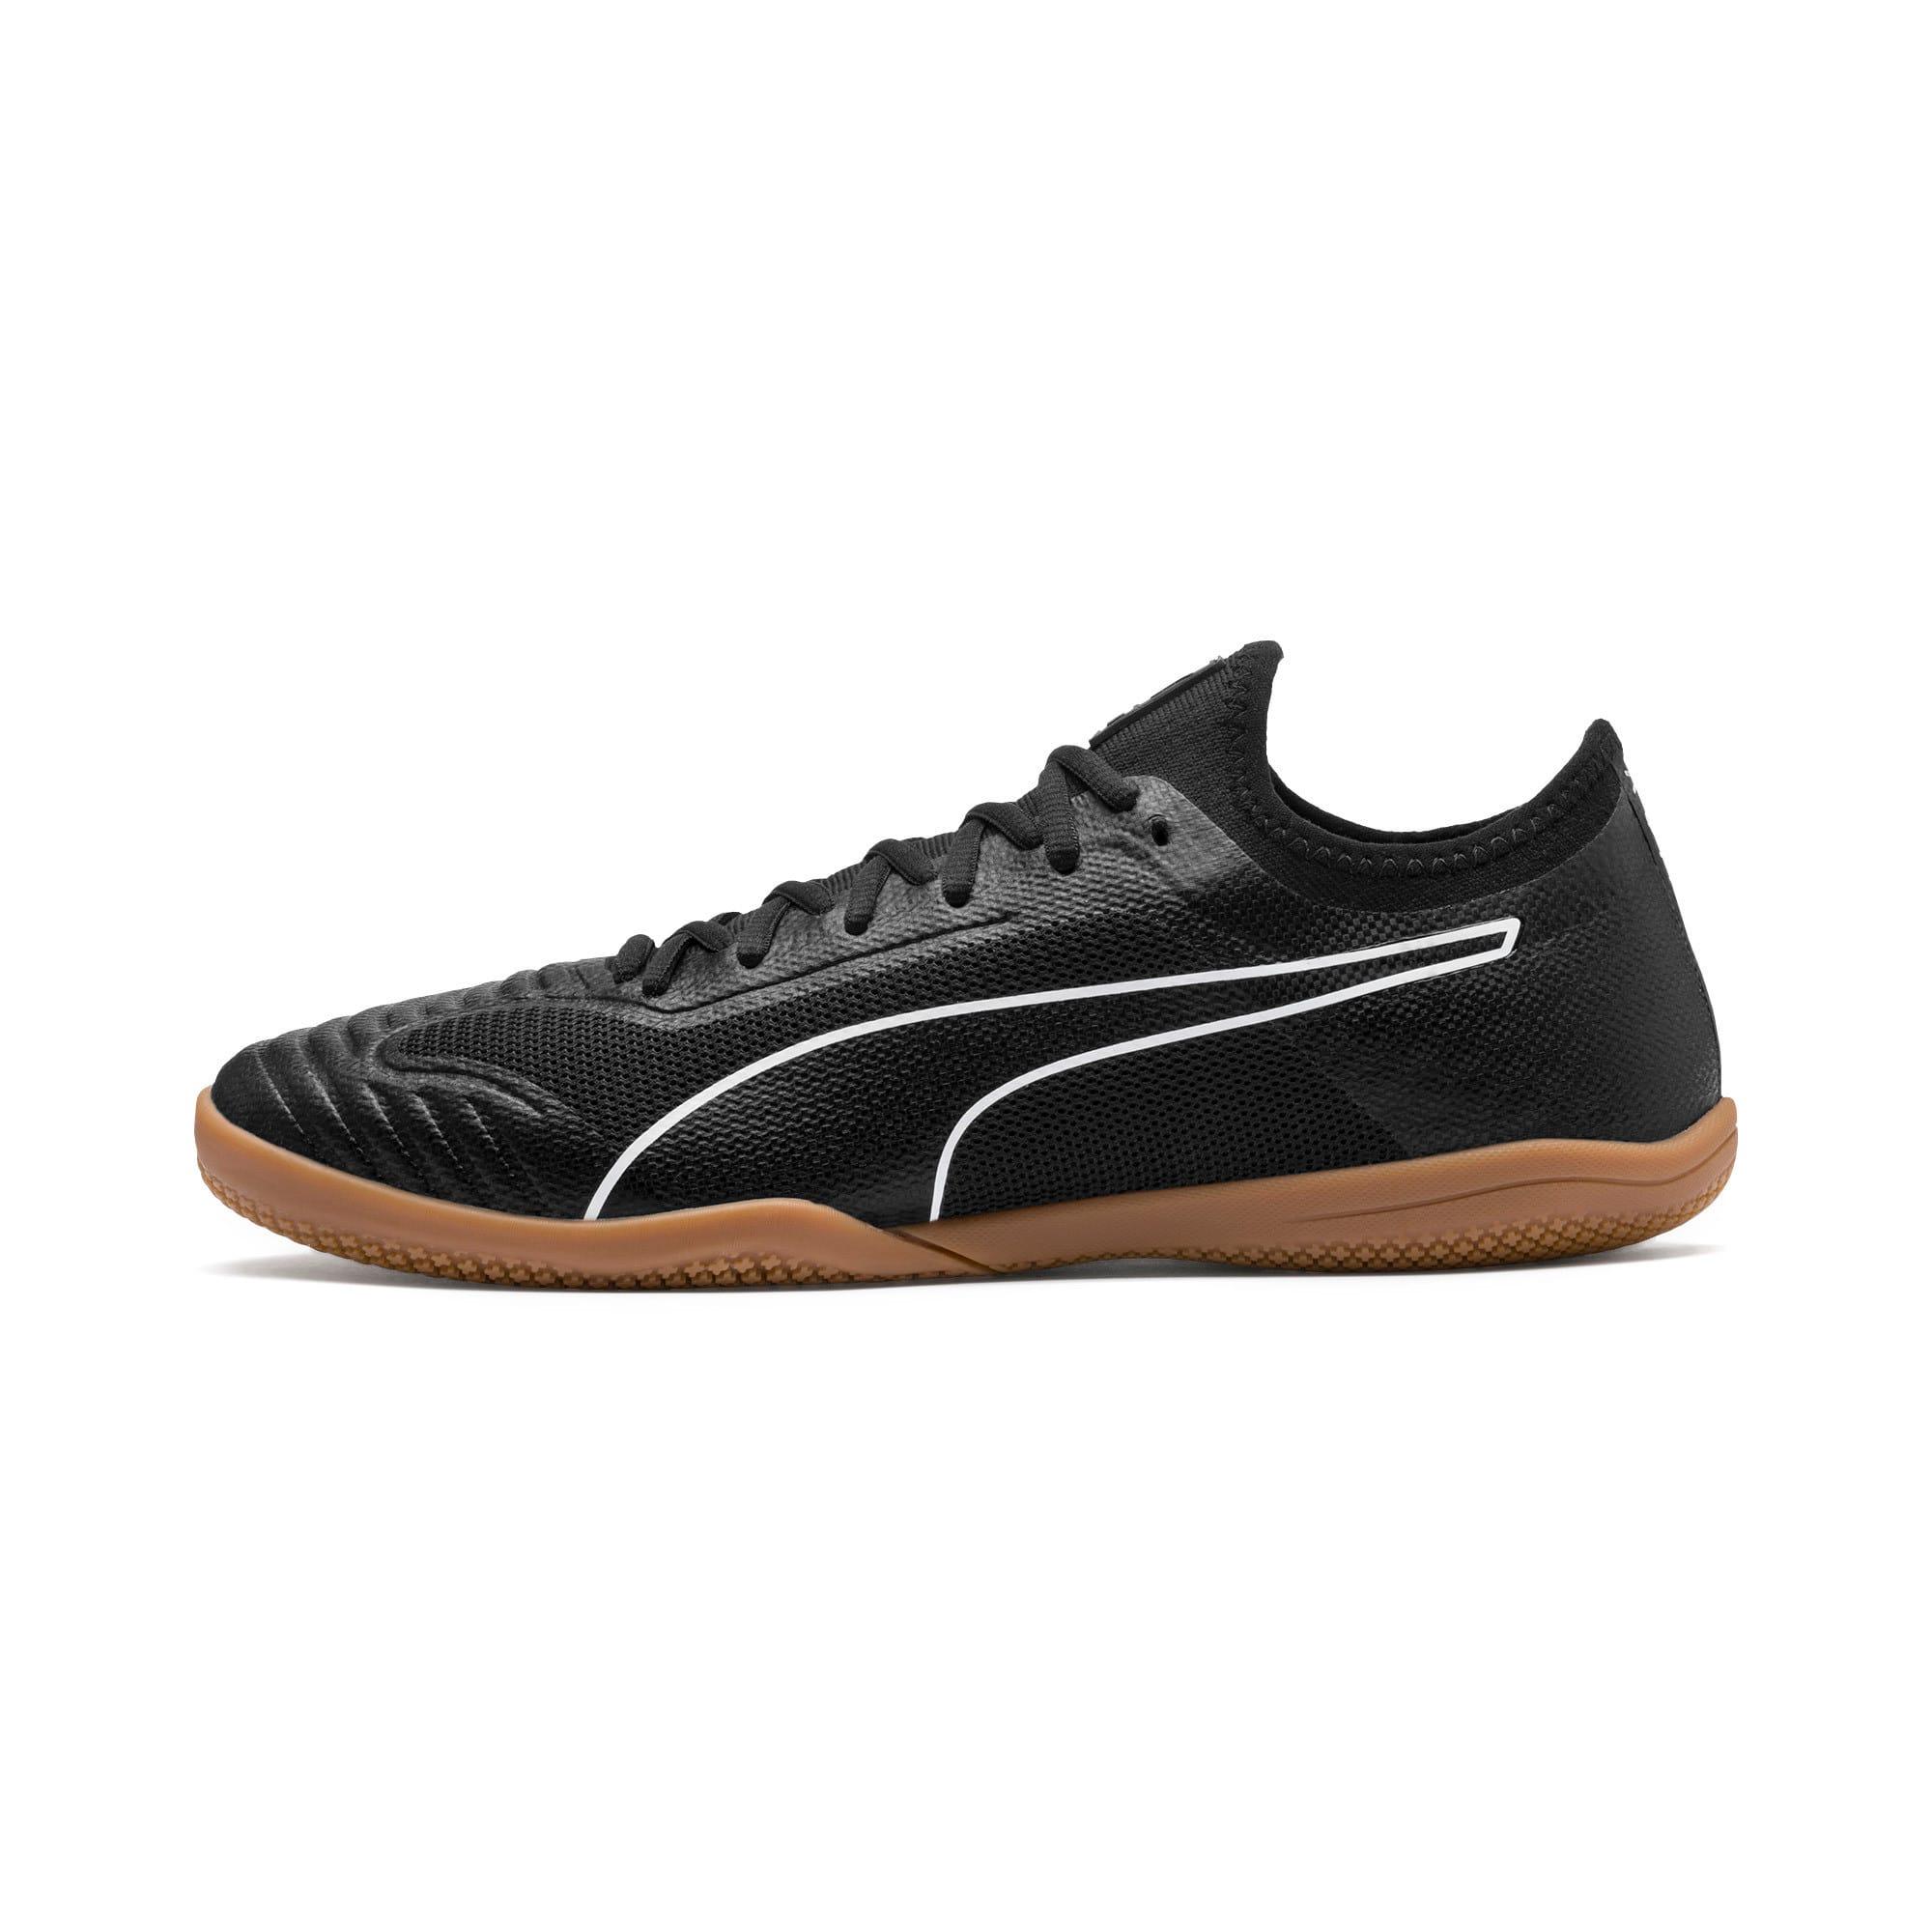 Thumbnail 1 of 365 Sala 1 Men's Soccer Shoes, Puma Black-Puma White-Gum, medium